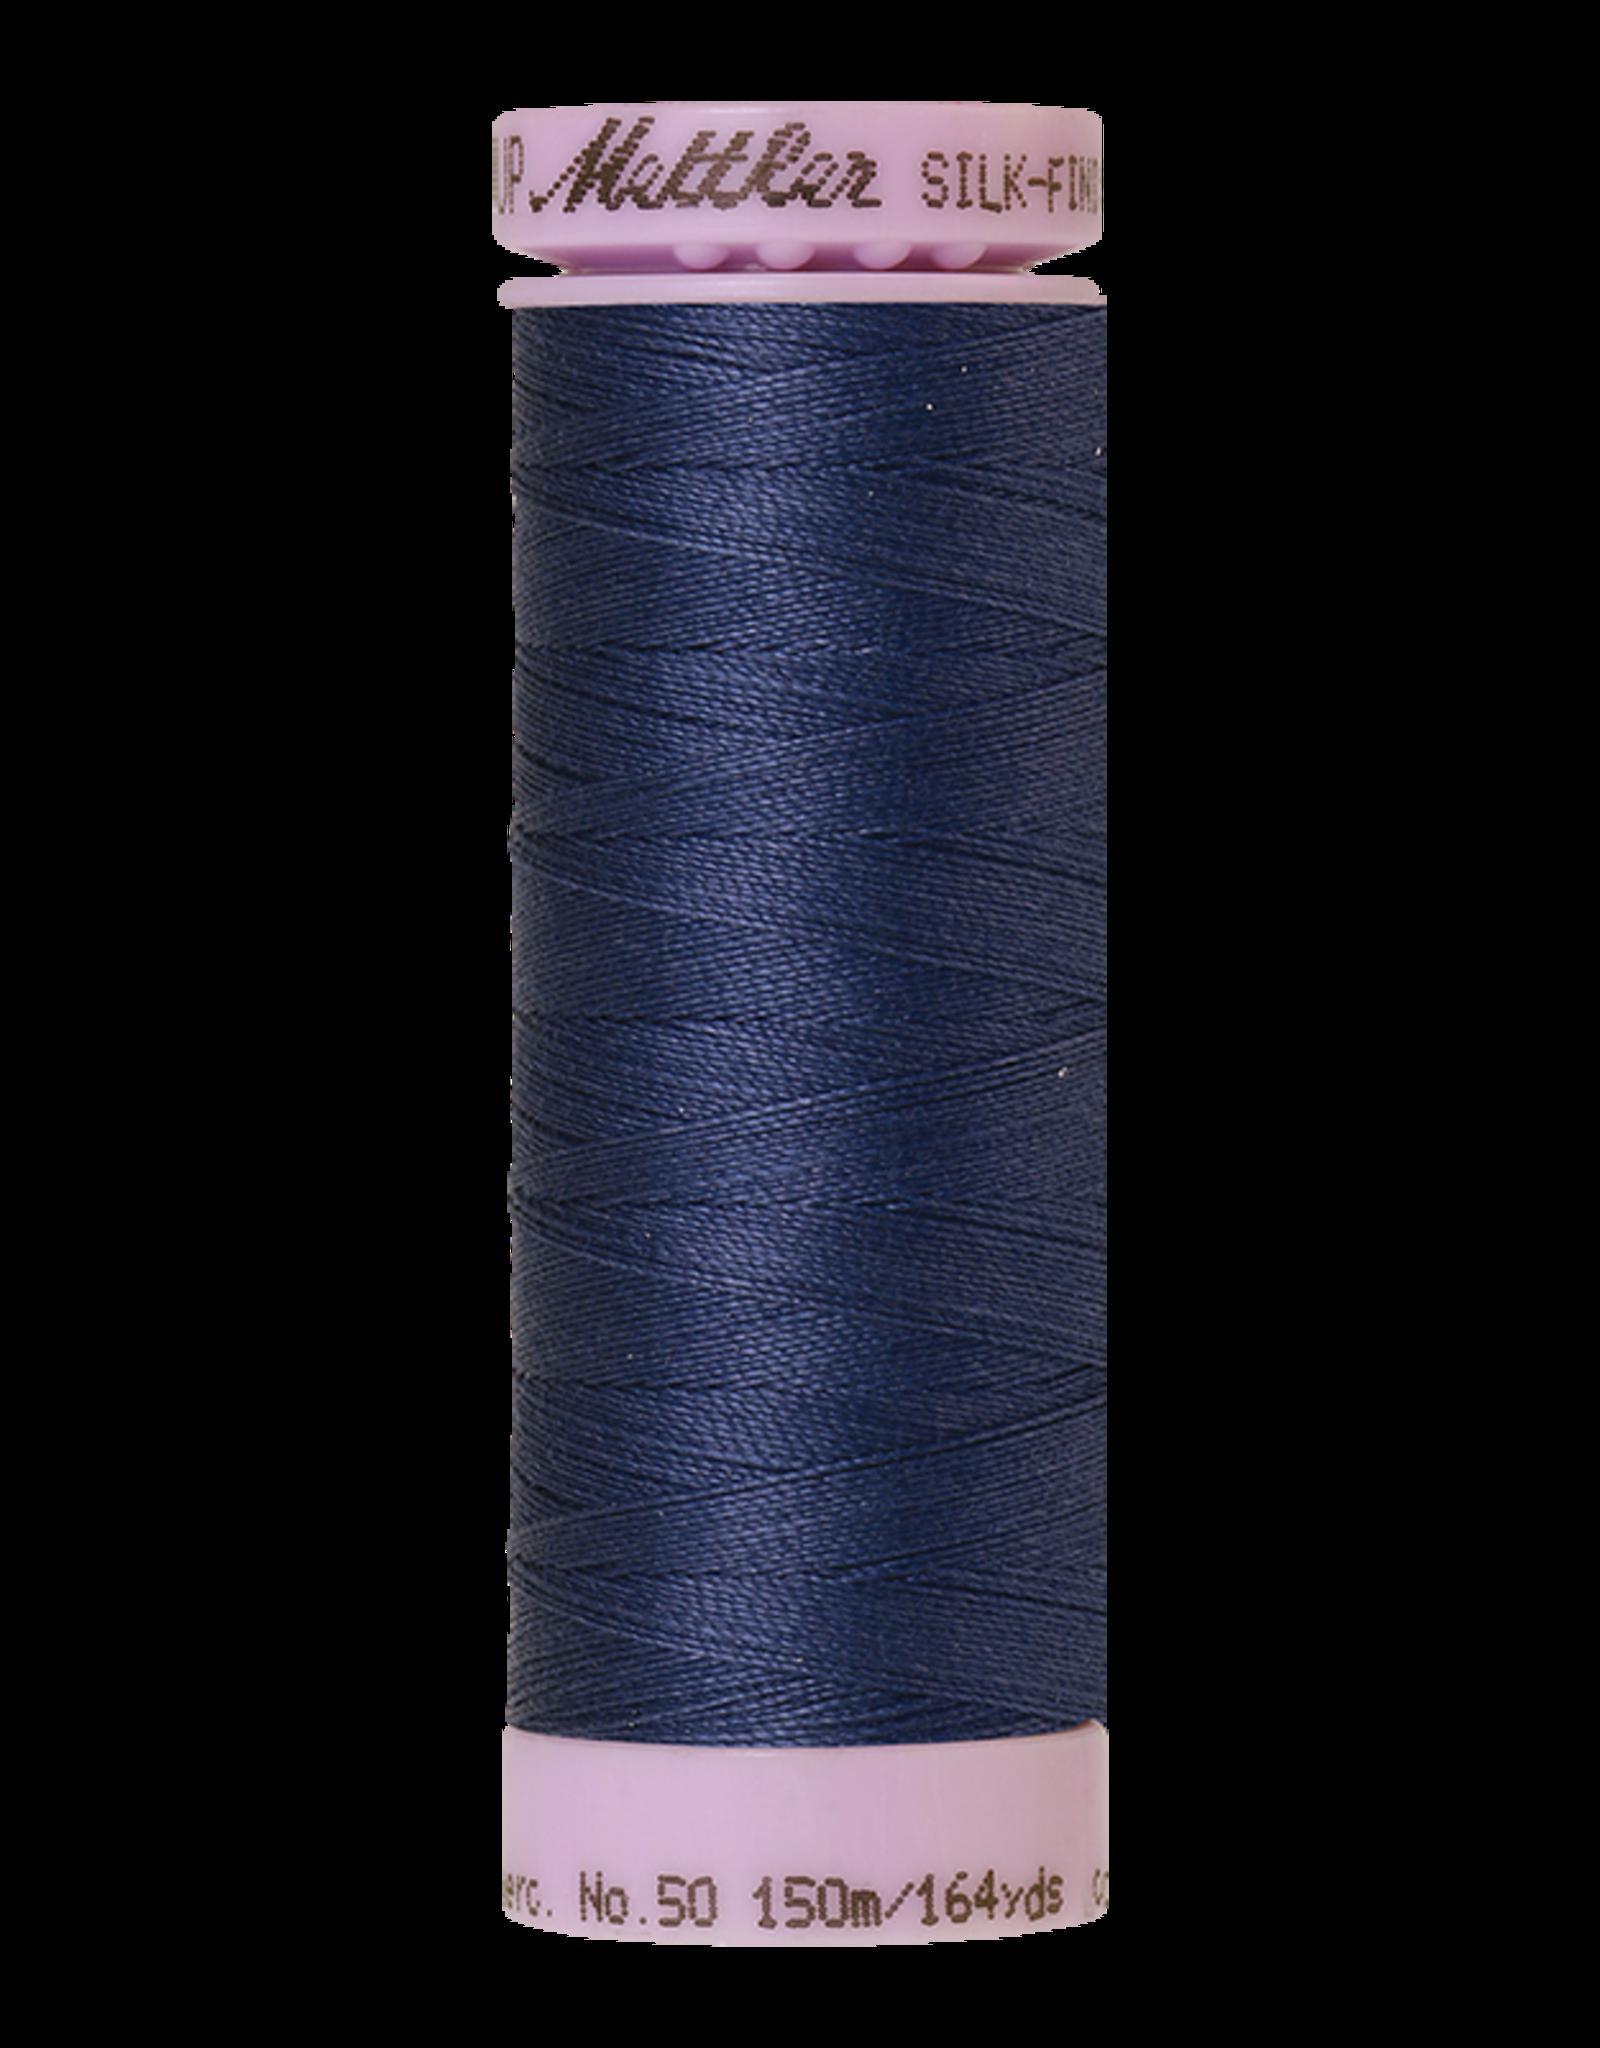 Mettler Silk Finish Cotton 50 - 150 meter - 1365